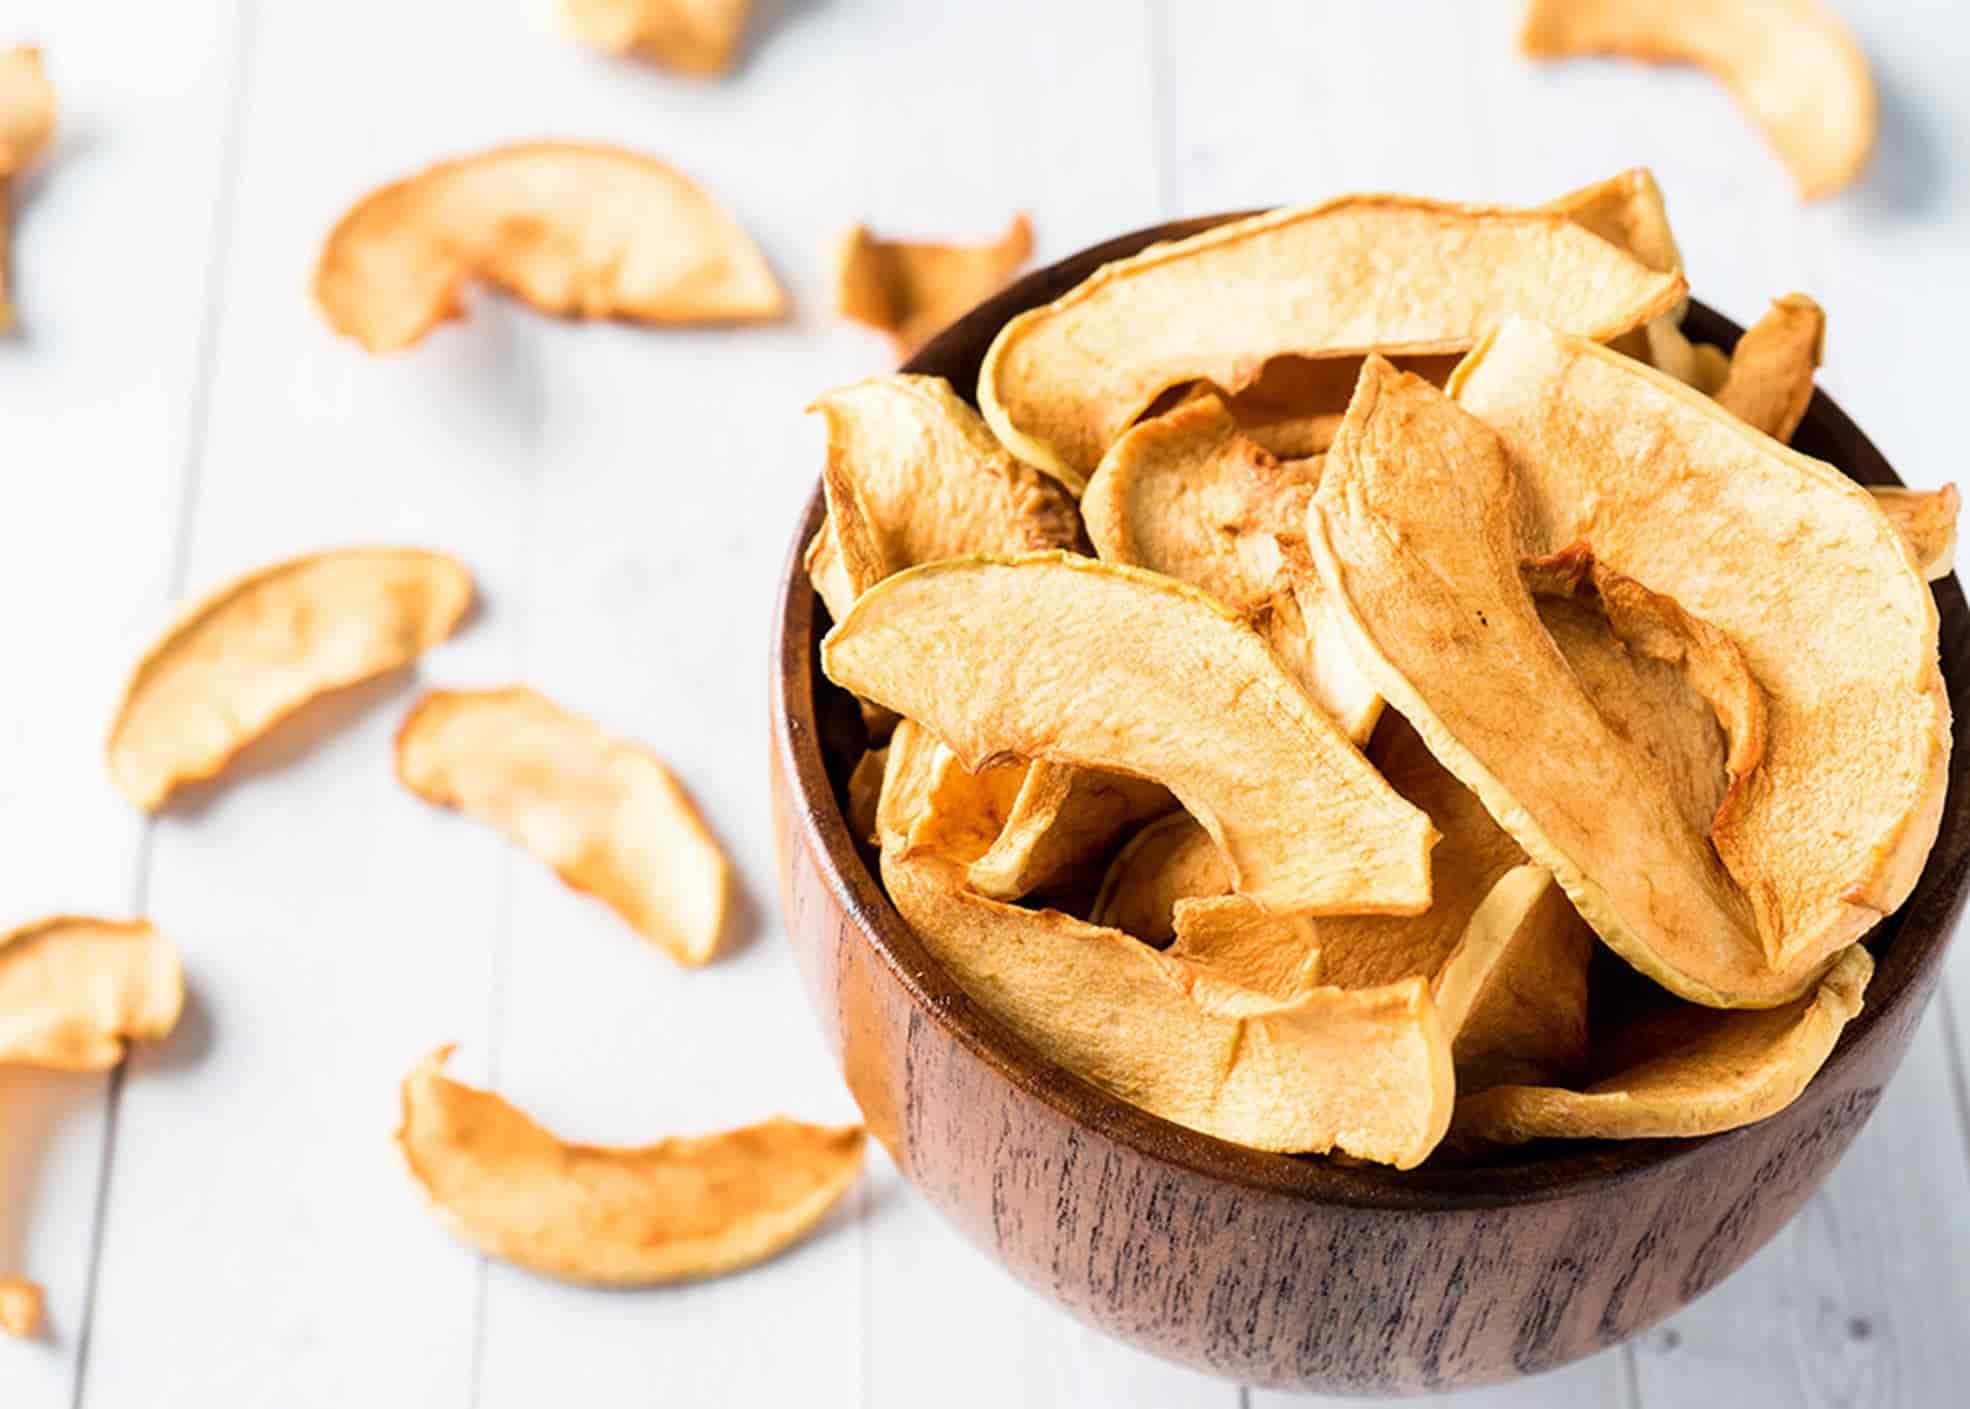 Aprenda receitas de chips de frutas e legumes simples e deliciosas